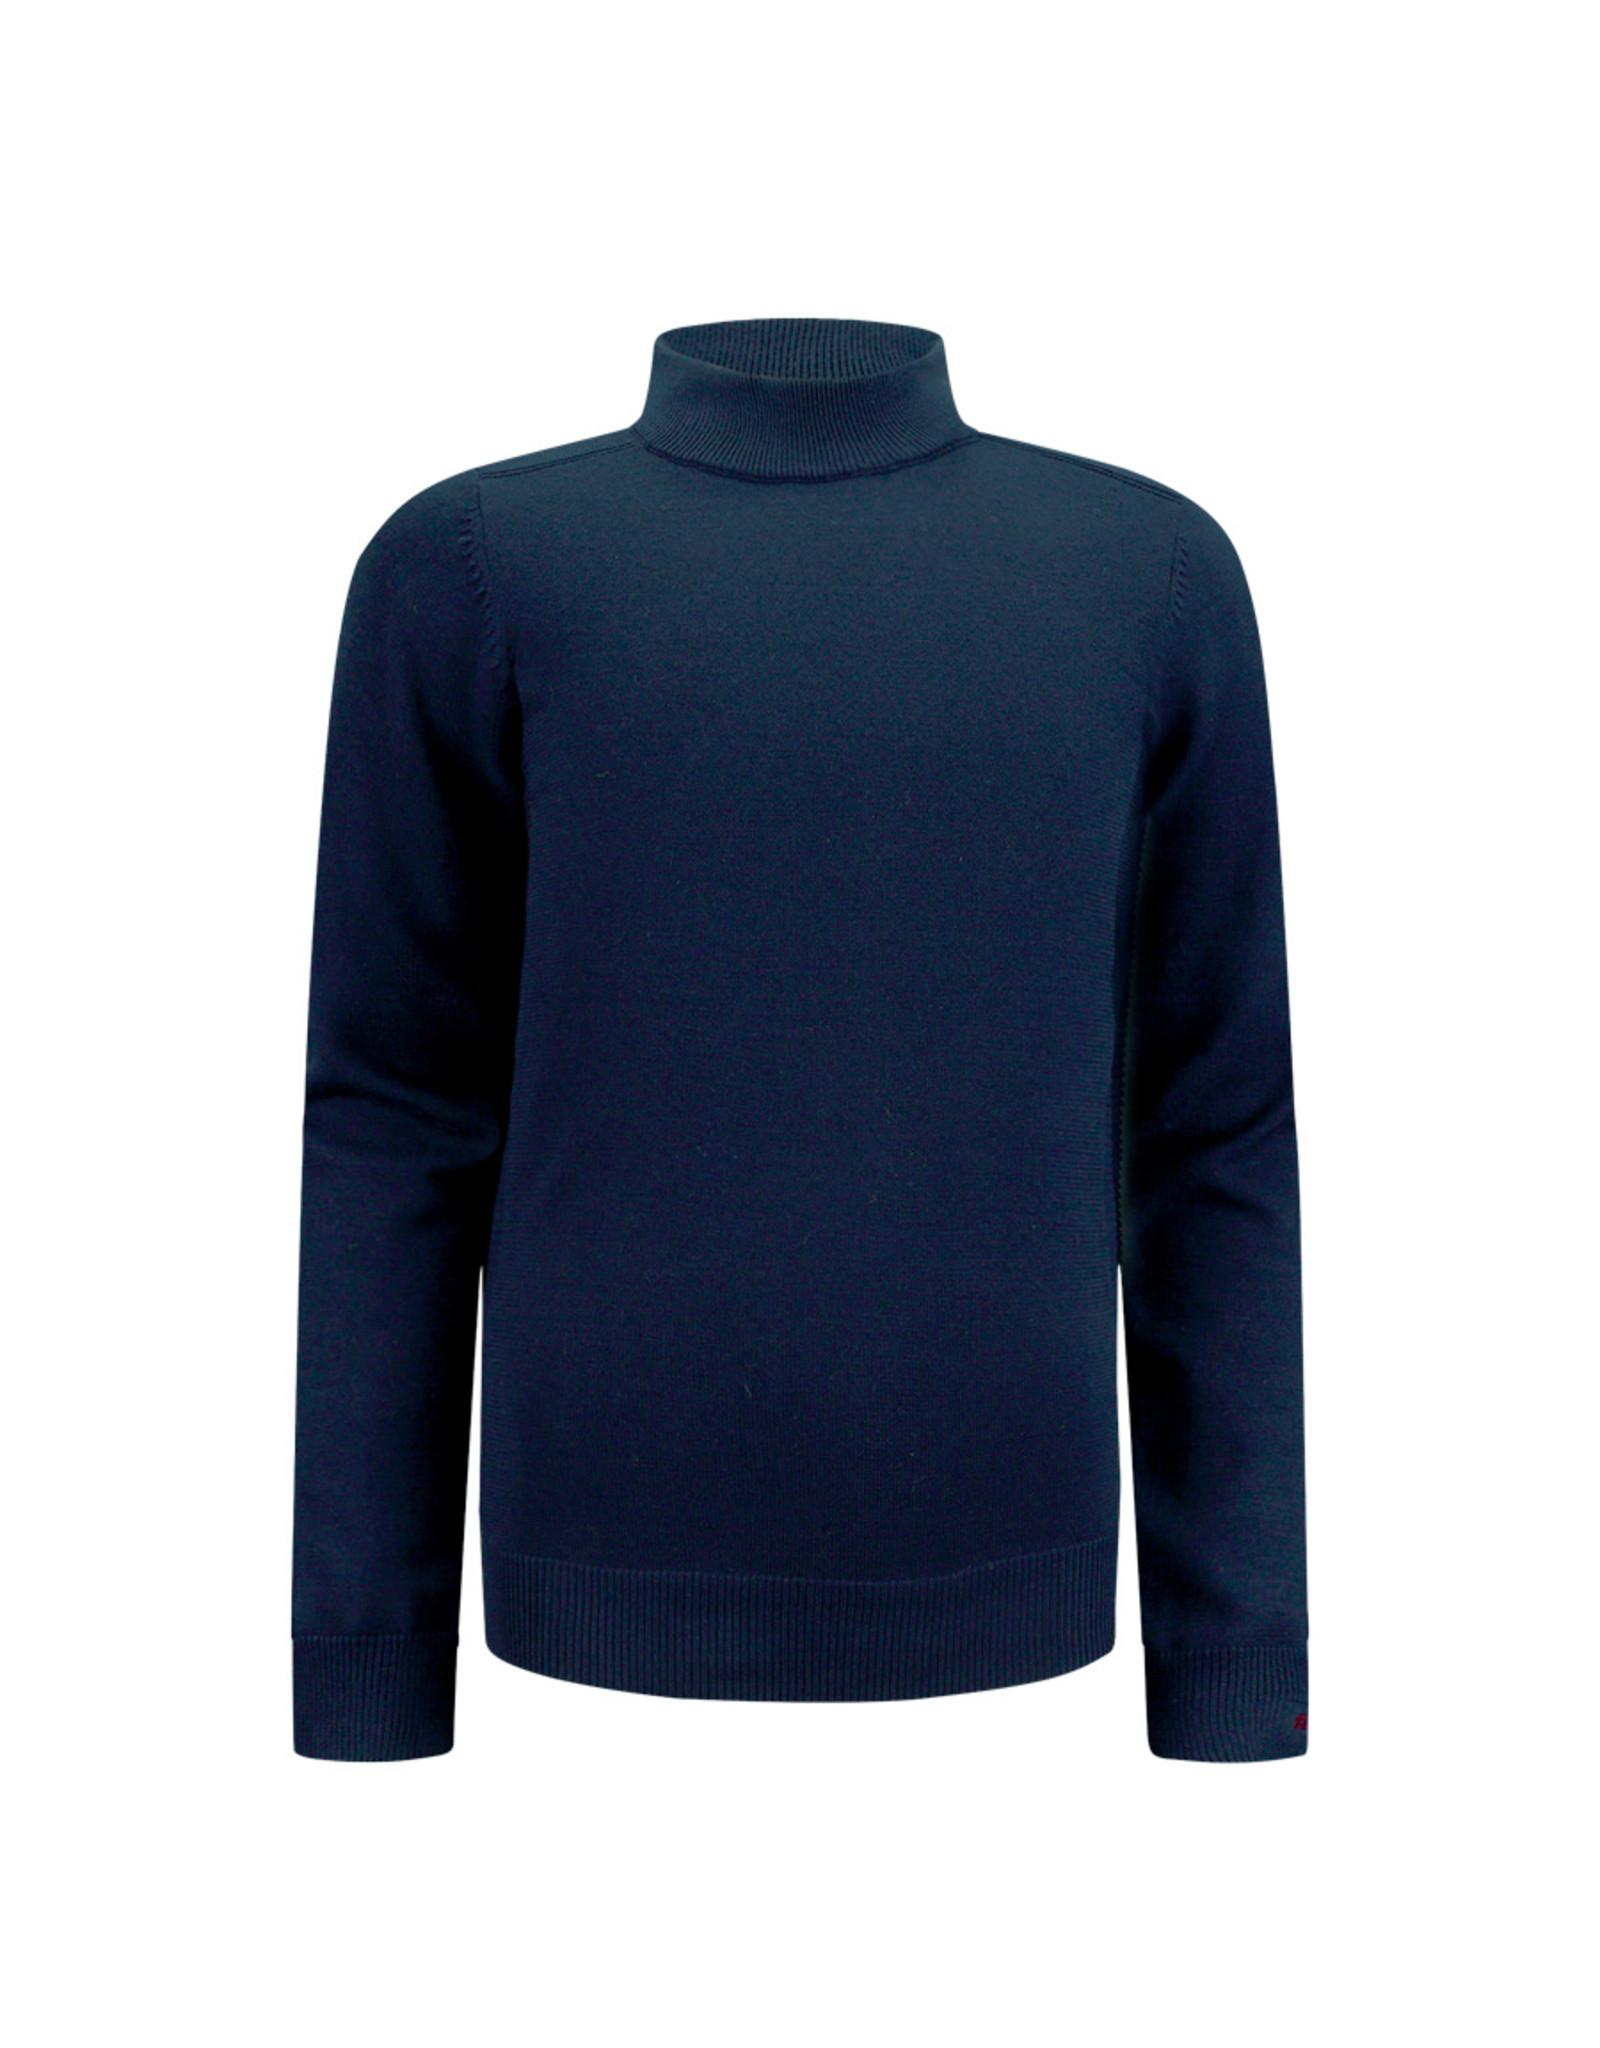 Retour Jeans Boys Floyd Knitwear Dark Navy